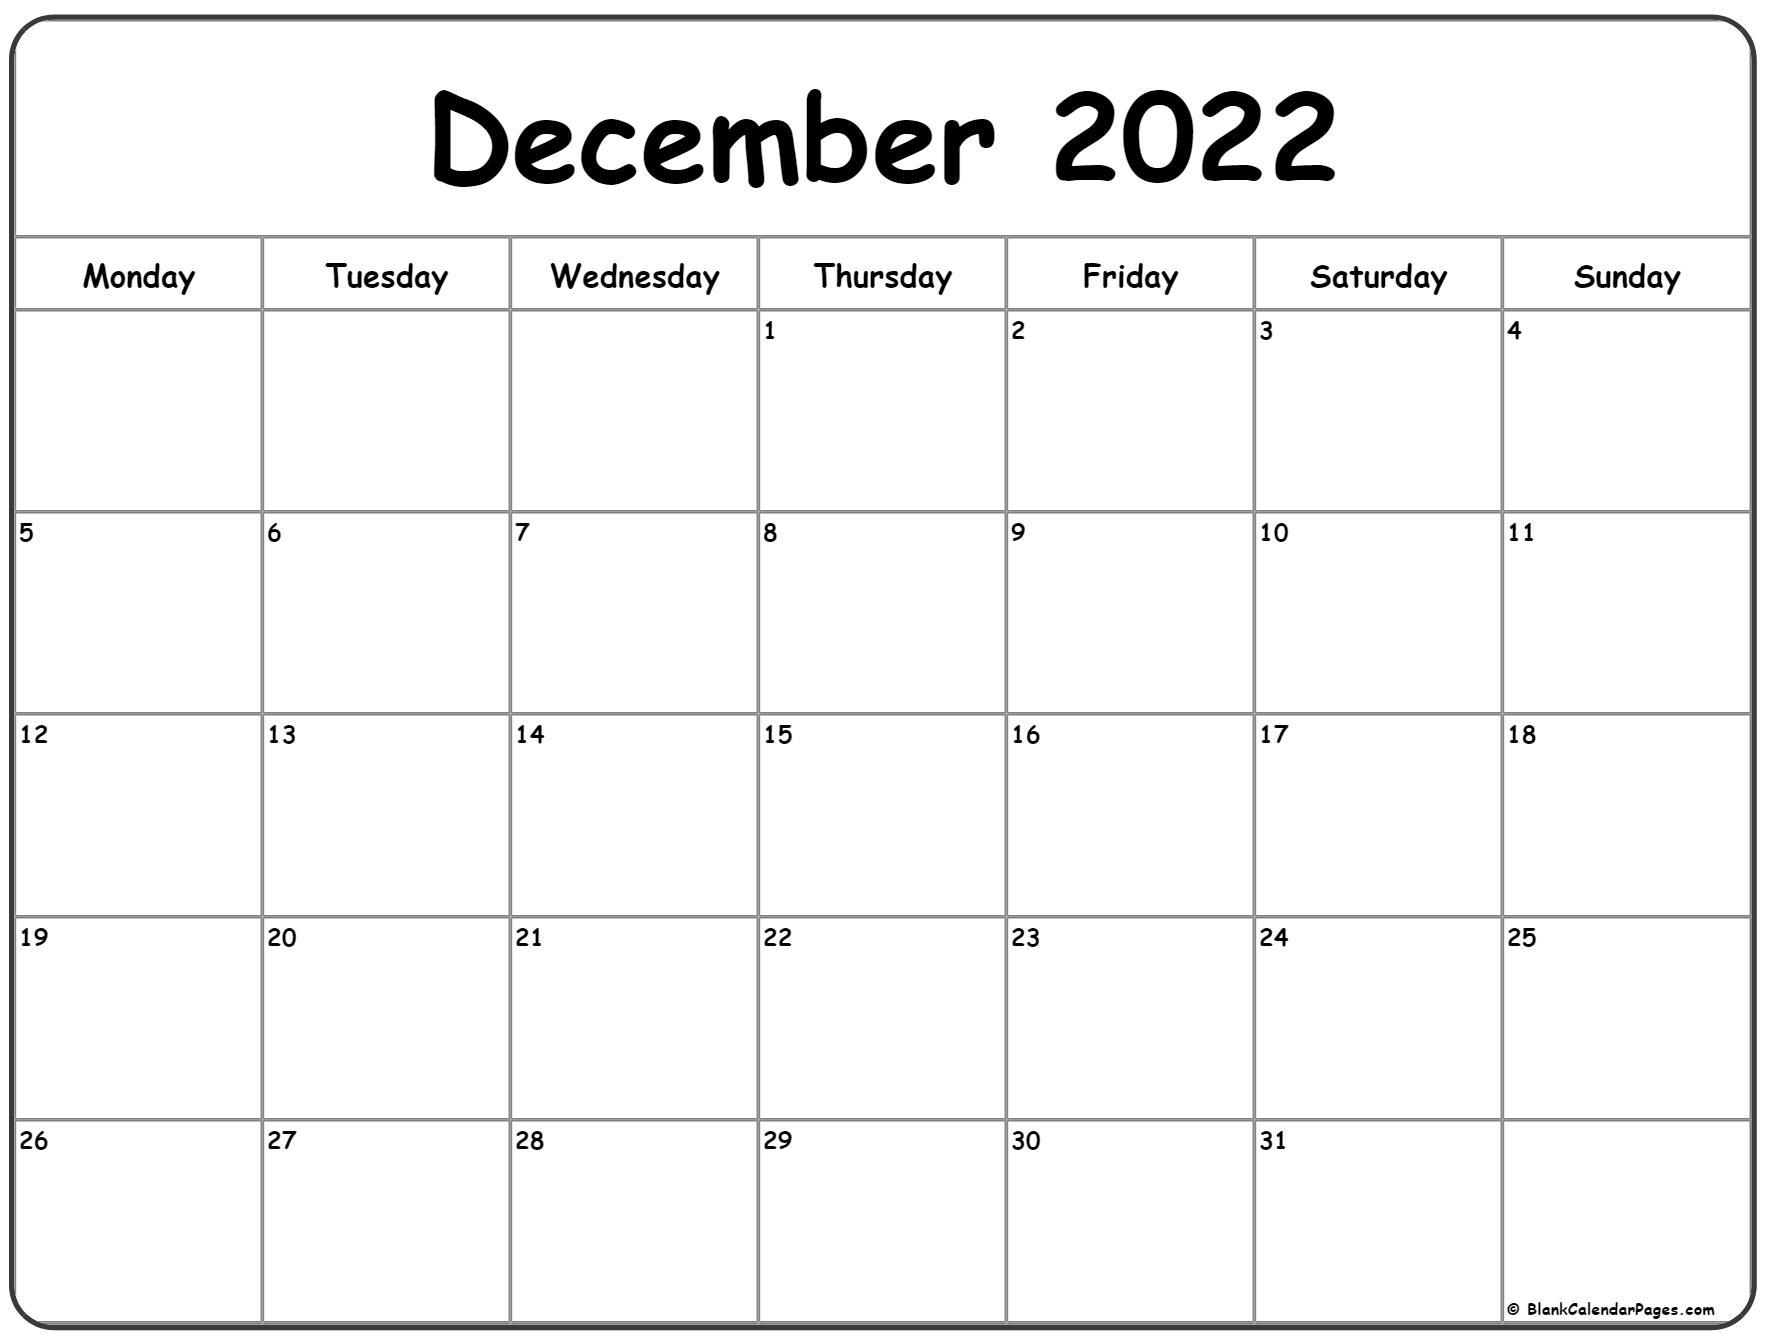 December 2022 Monday Calendar   Monday To Sunday